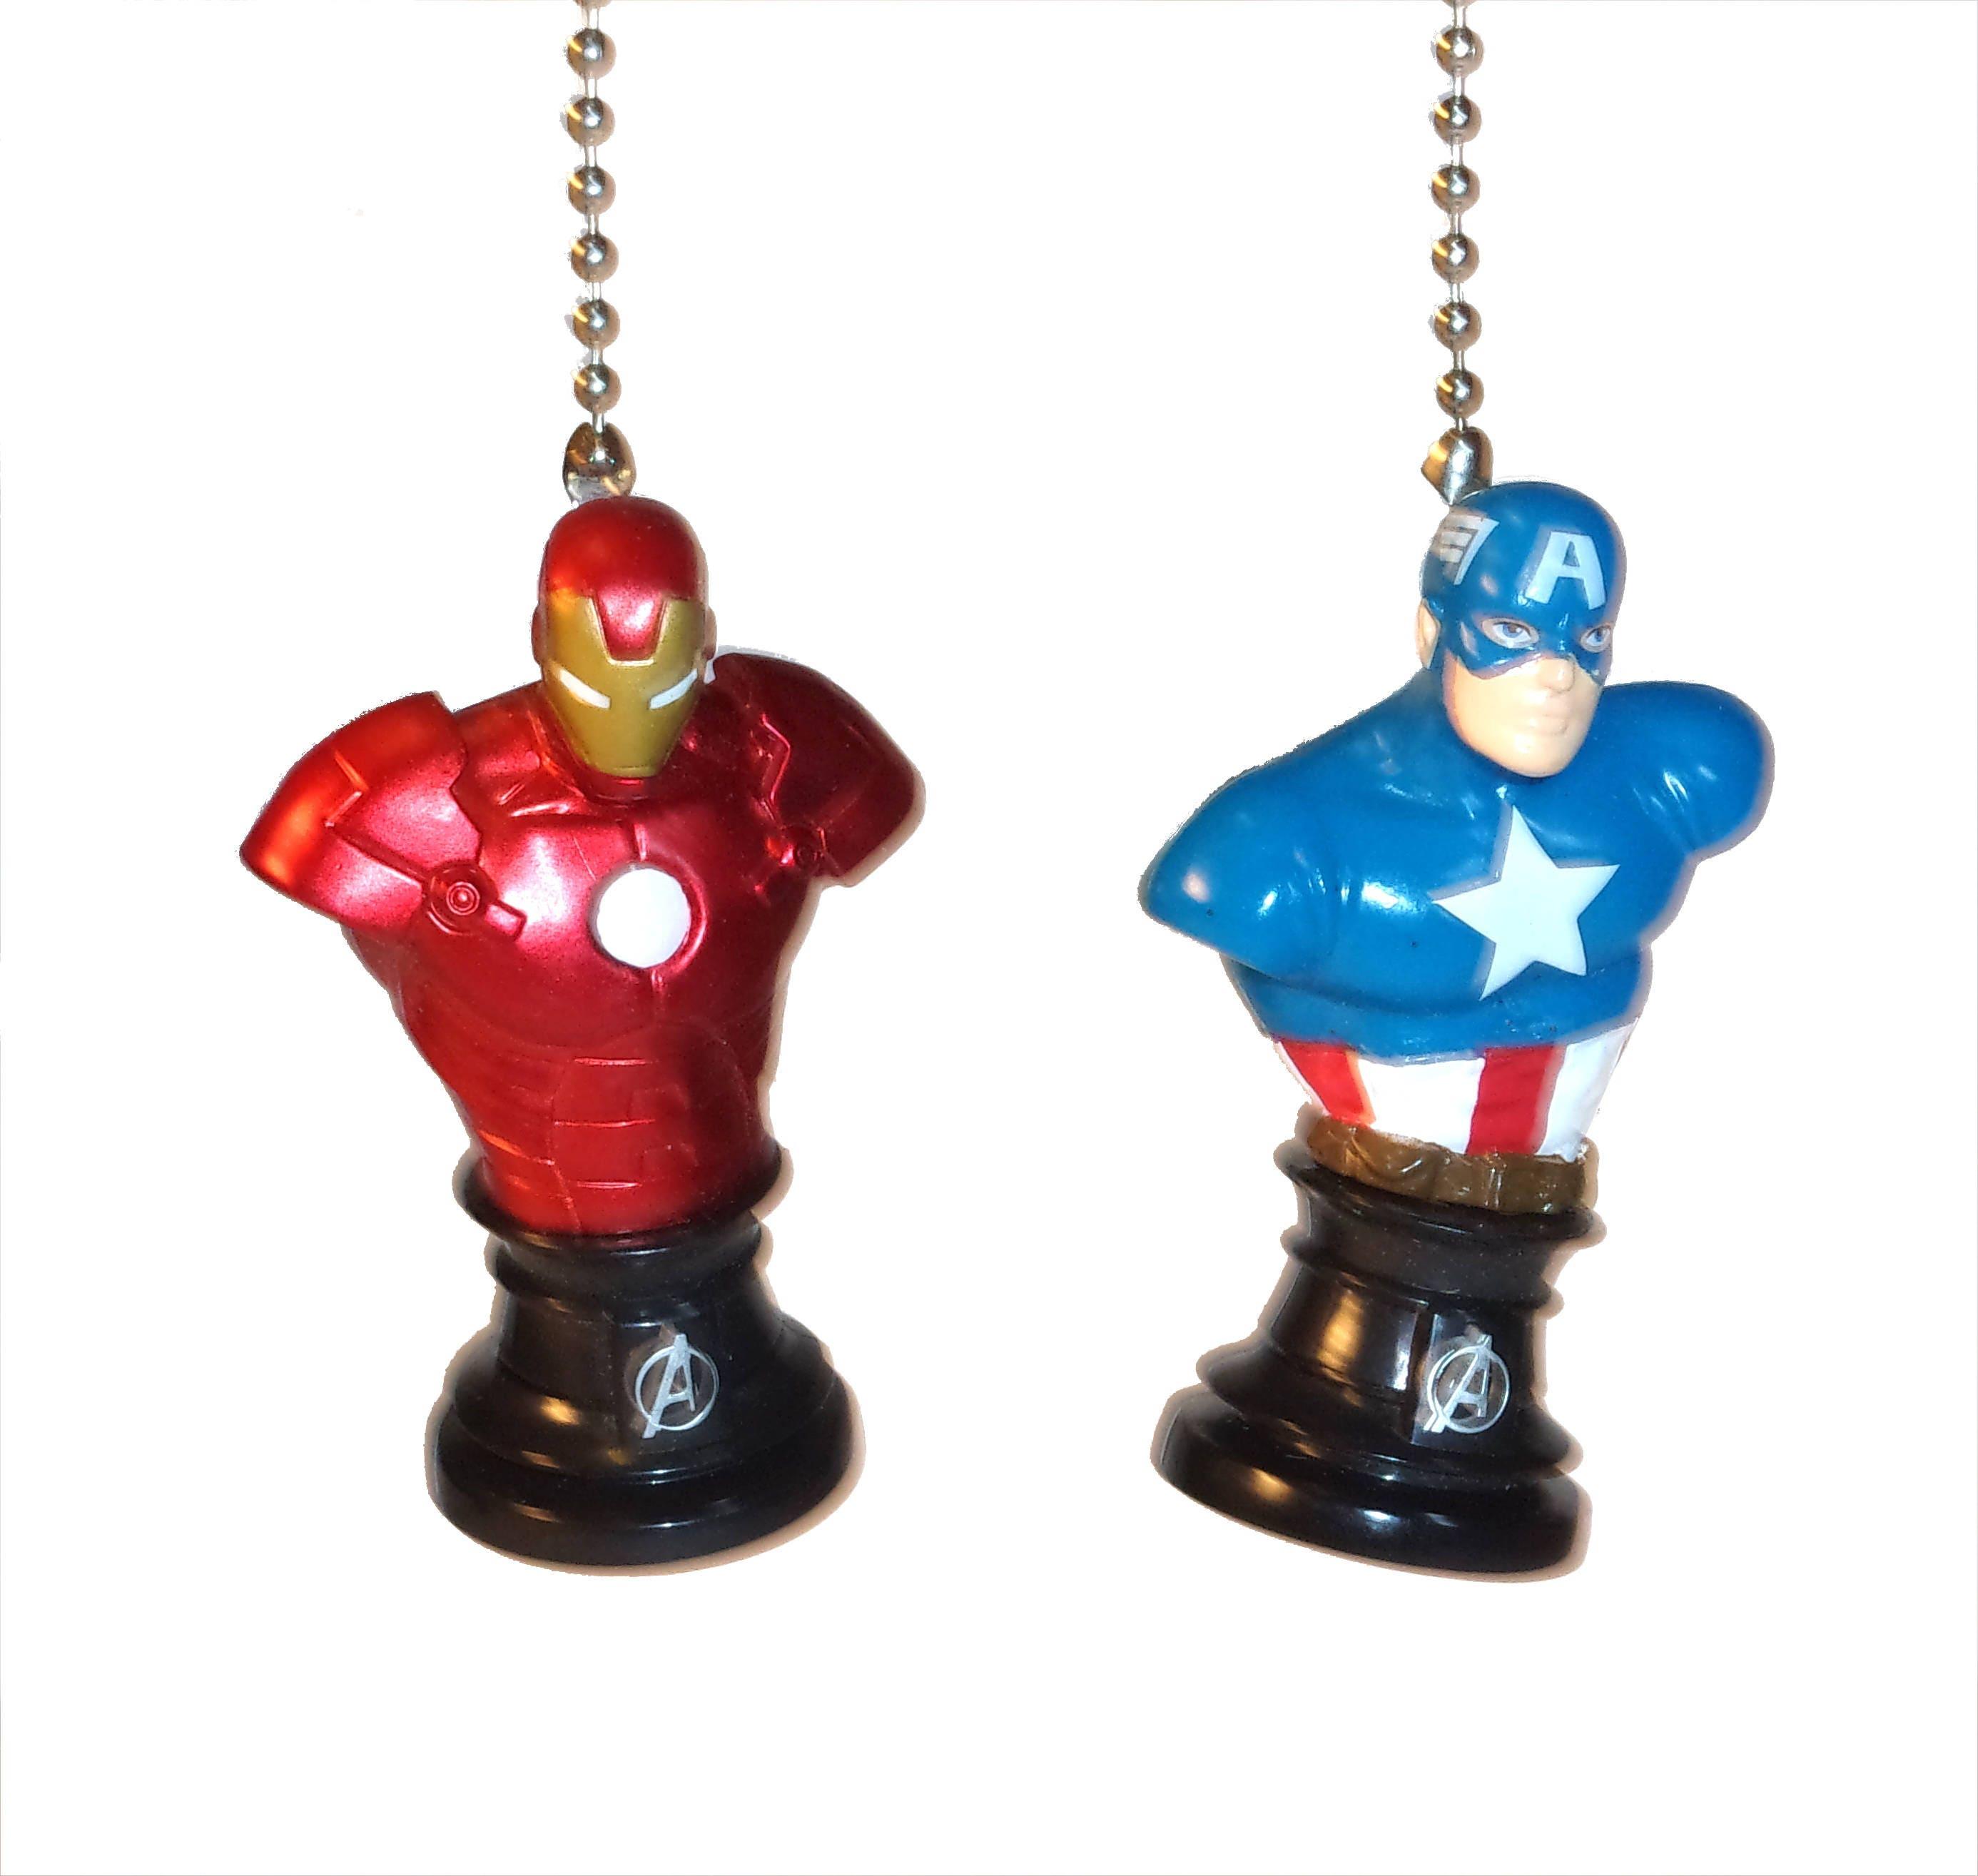 Capt America Vs Iron Man Ceiling Fan Light Pulls  Avengers  Civil War  Kids Room  Decor  Man Cave Decor  Gift for Boys  Gift for Kids. Capt America Vs Iron Man Ceiling Fan Light Pulls  Avengers  Civil